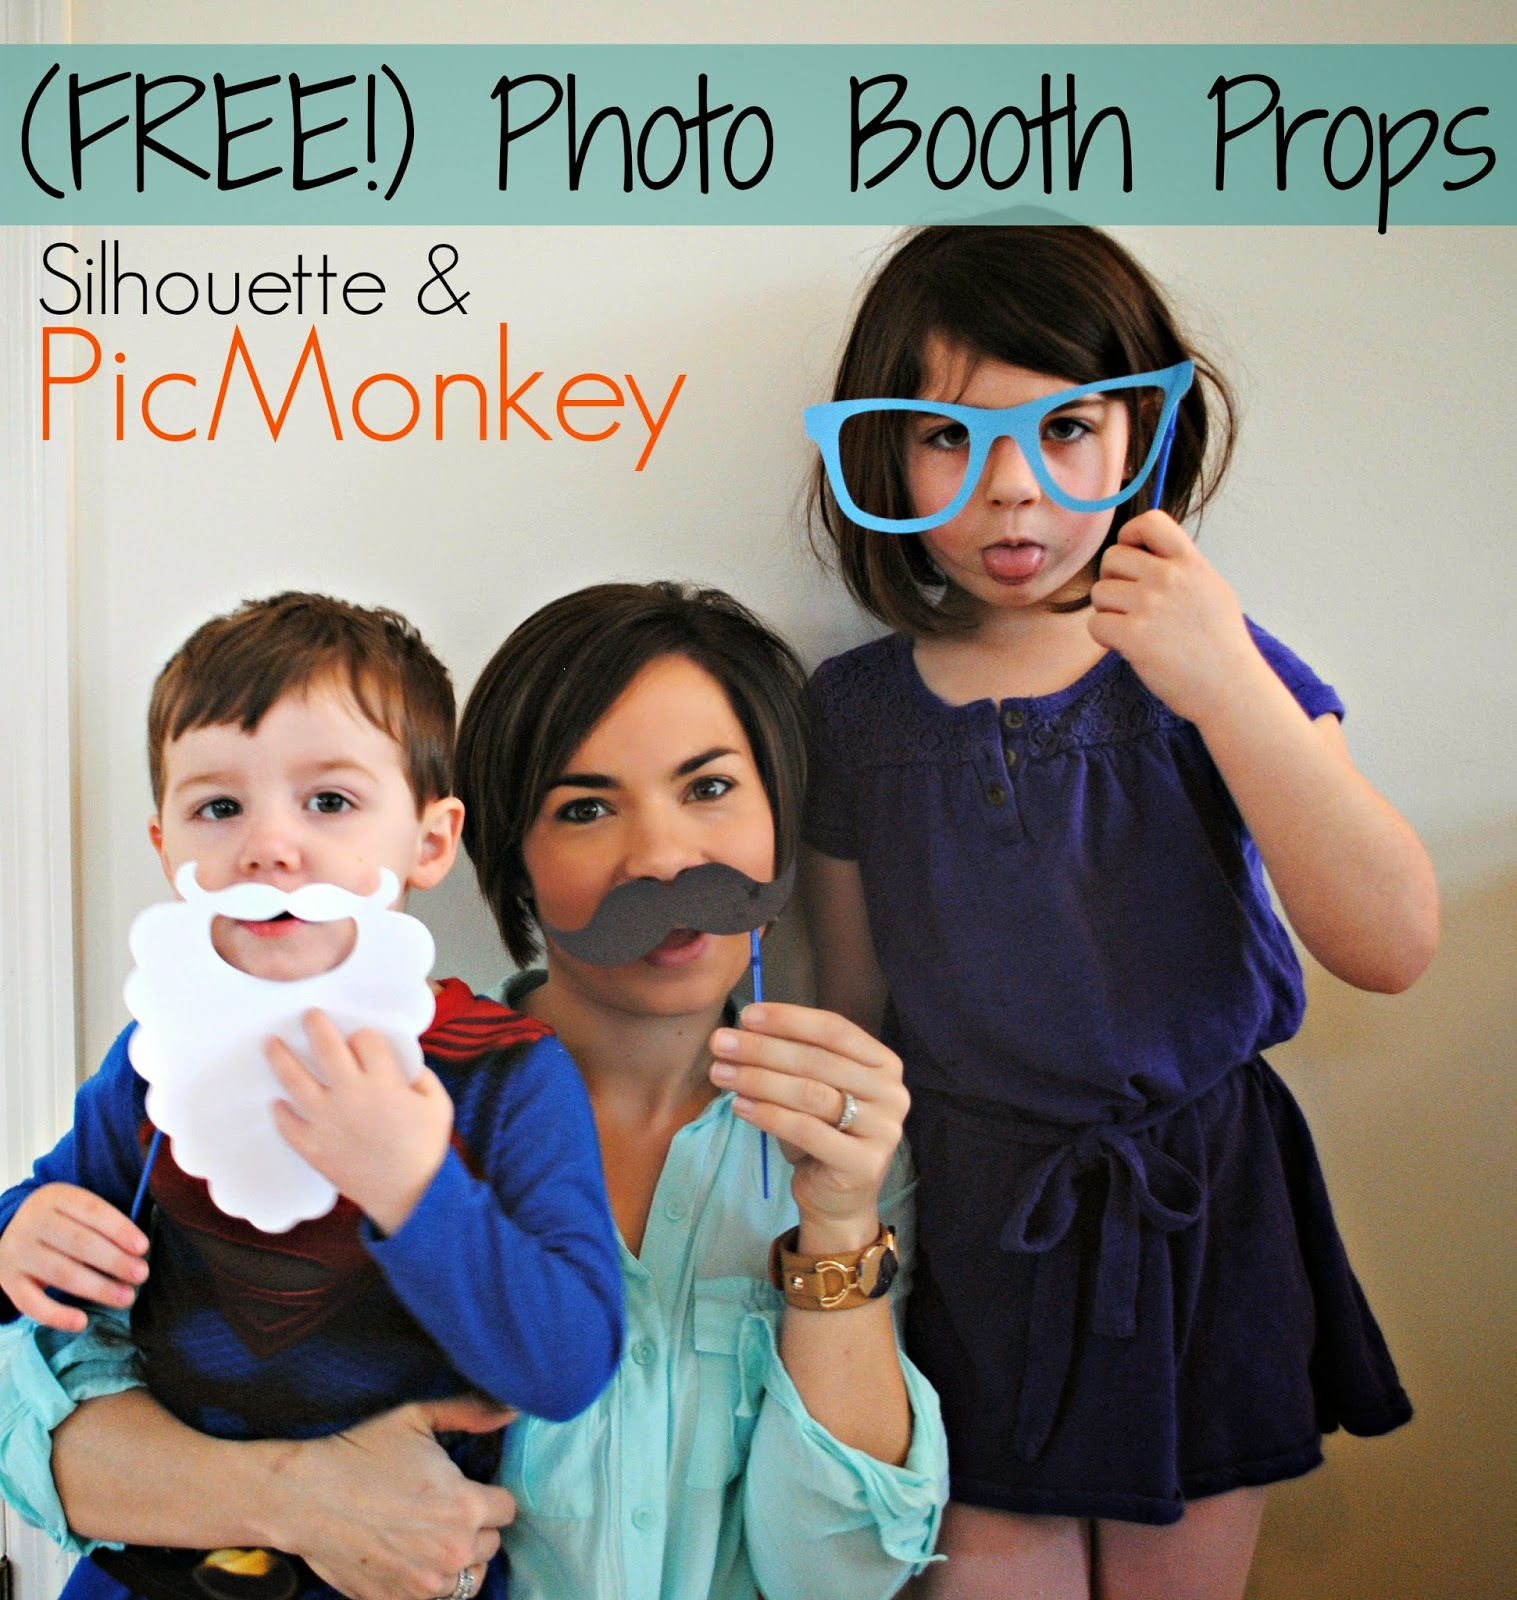 http://silhouetteschool.blogspot.com/2014/03/free-diy-photobooth-props-using.html